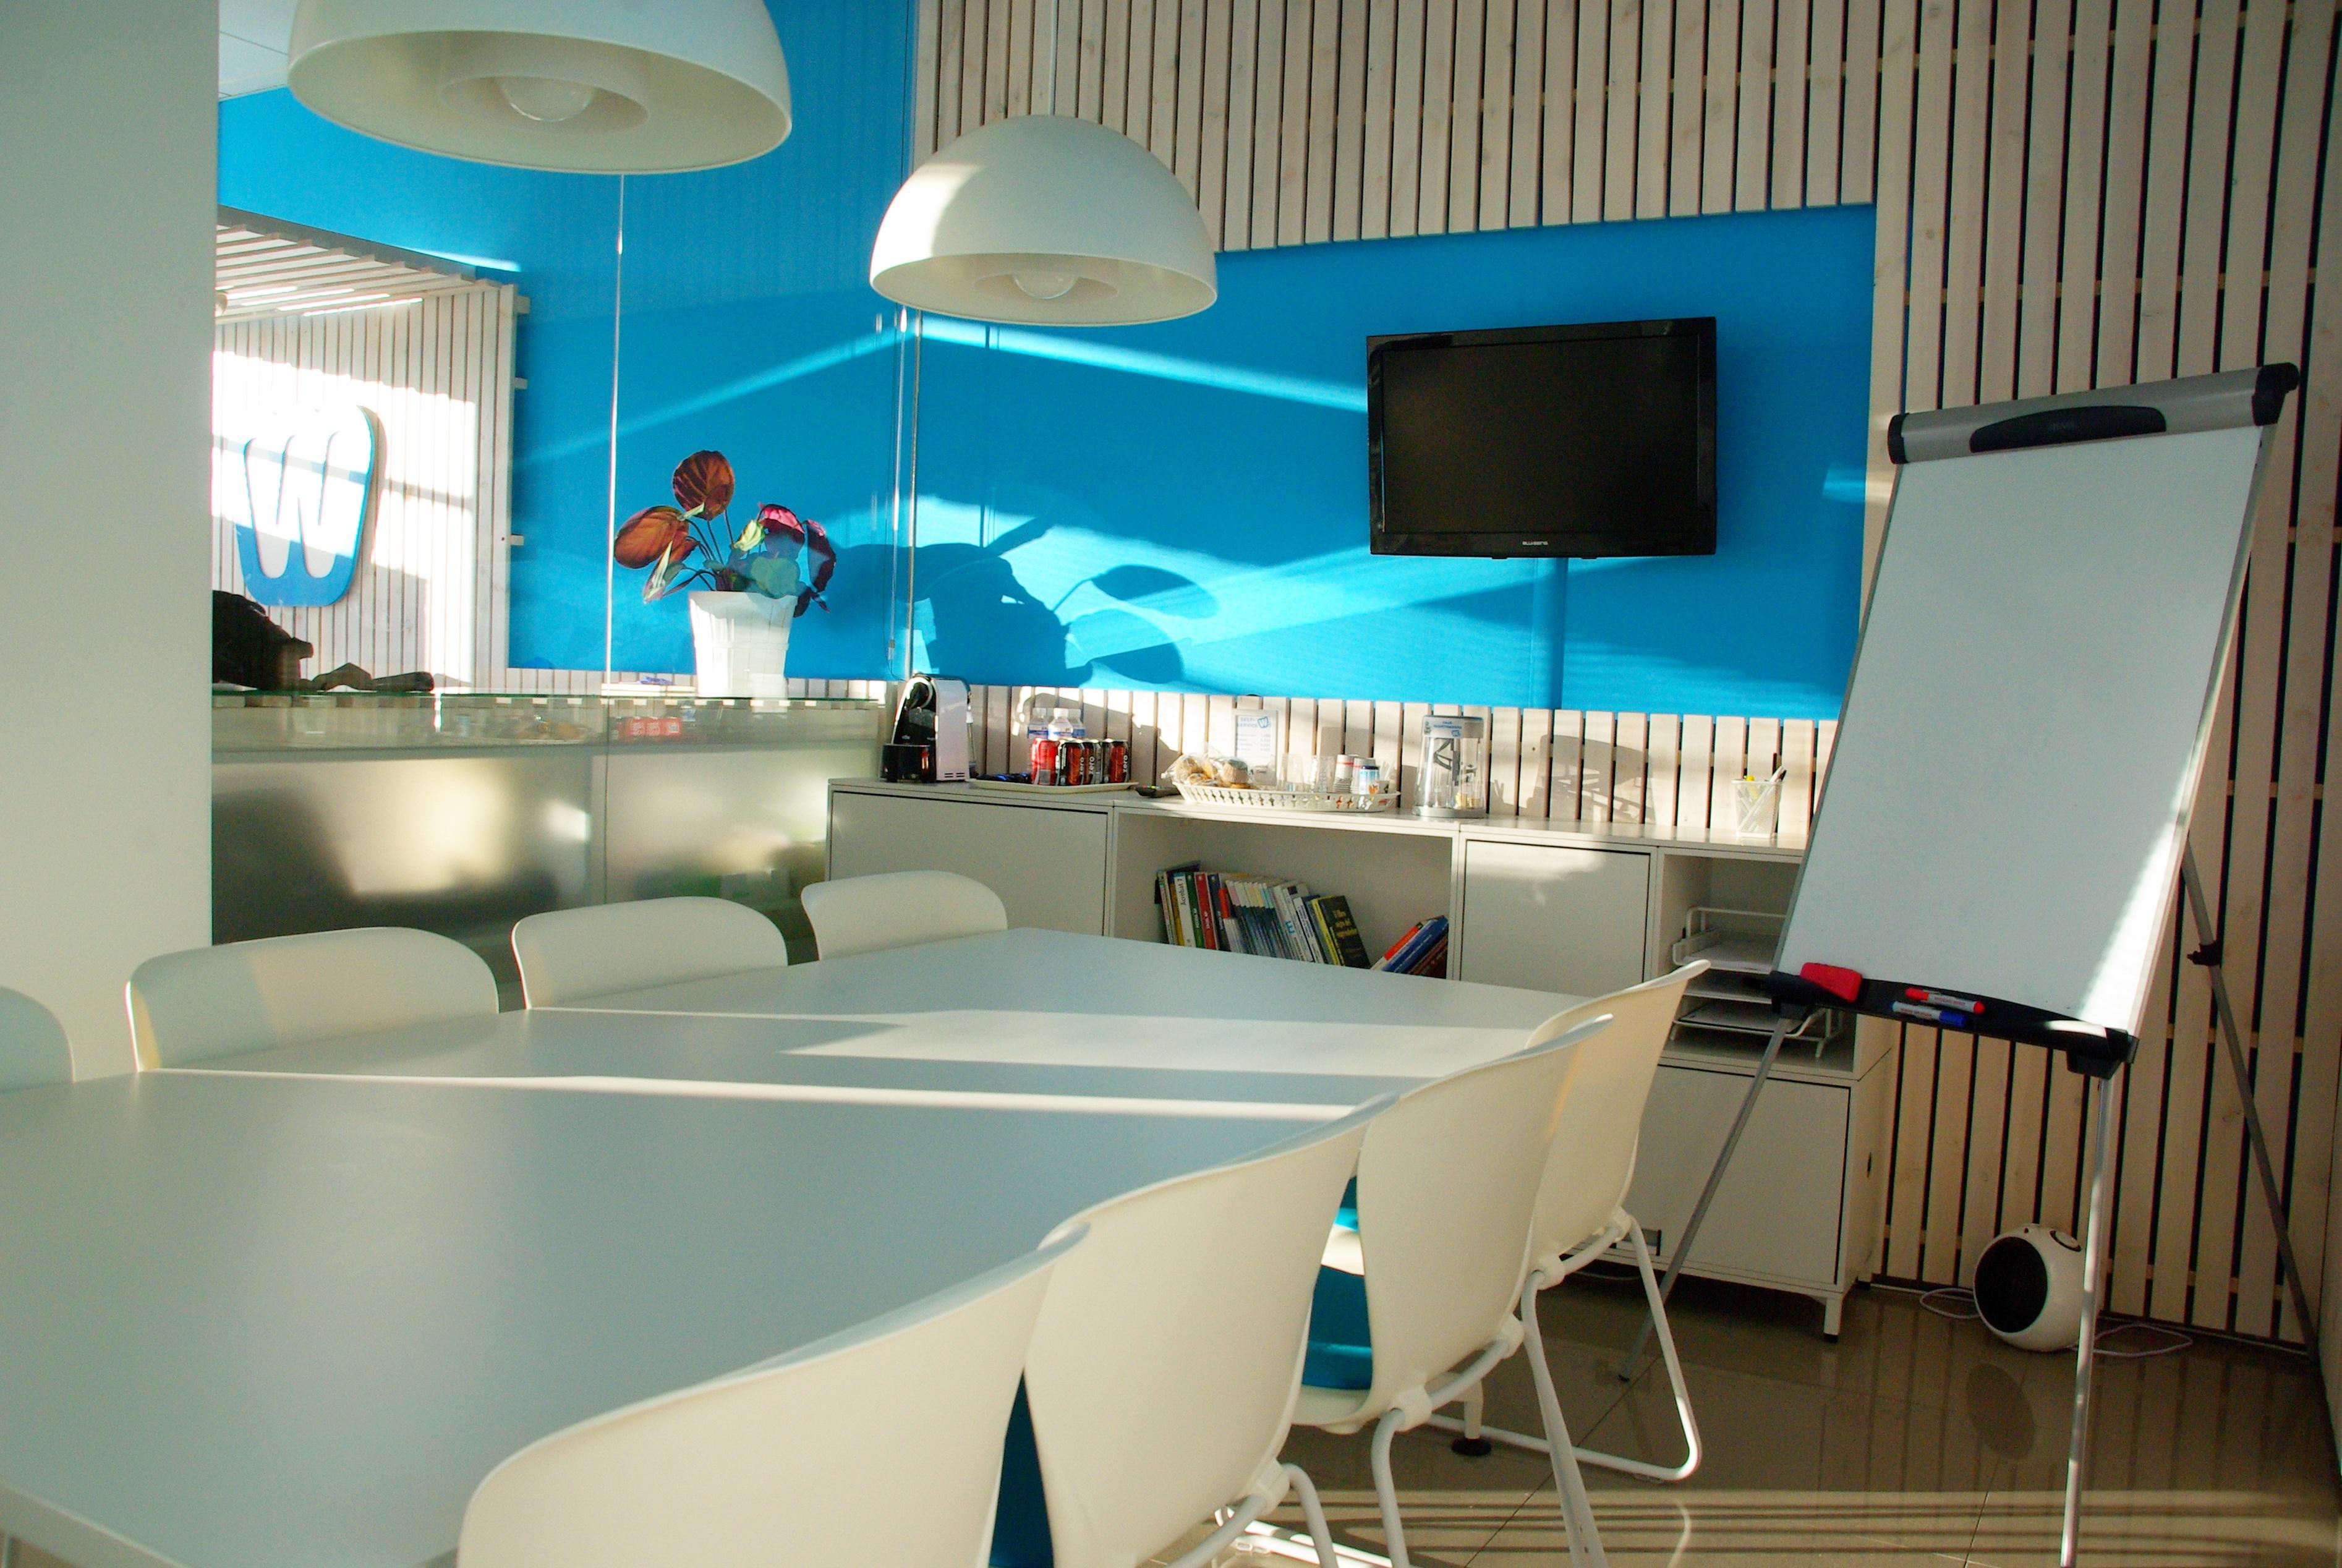 free images desk table light wood floor seat window ceiling rh pxhere com